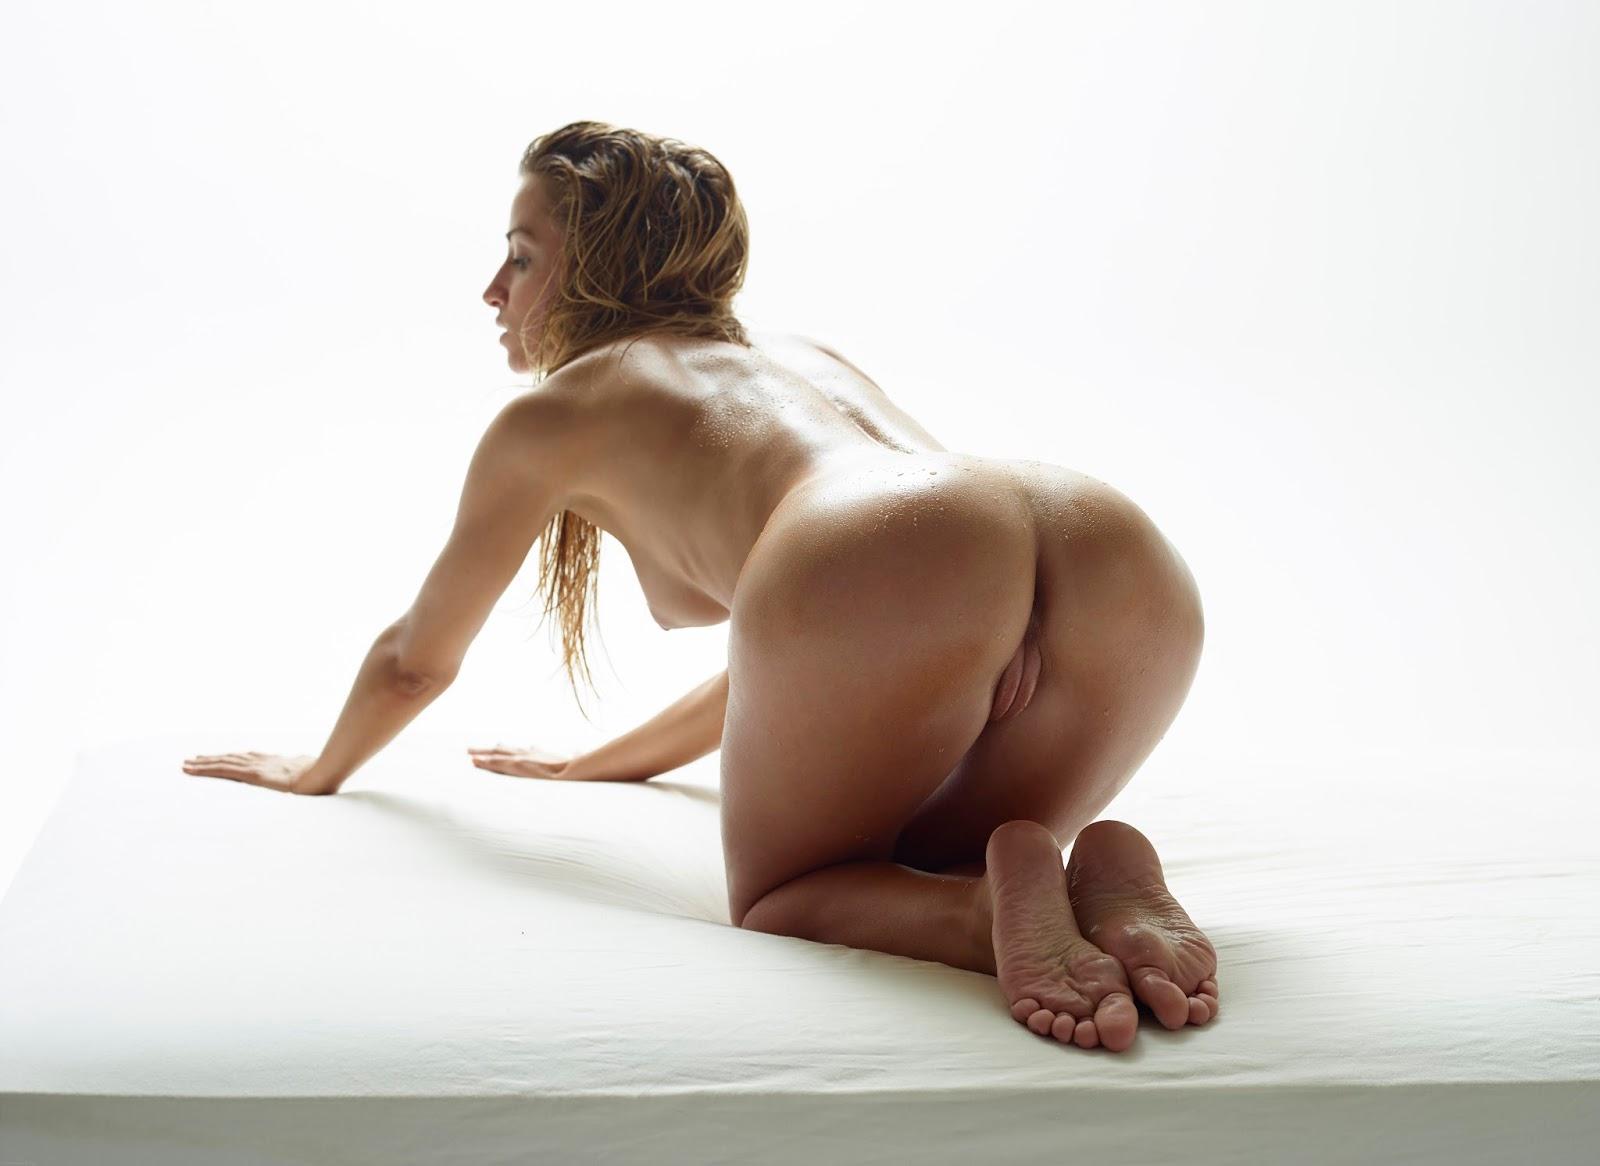 Pornfidelity lana rhoades awesome body works hard 3